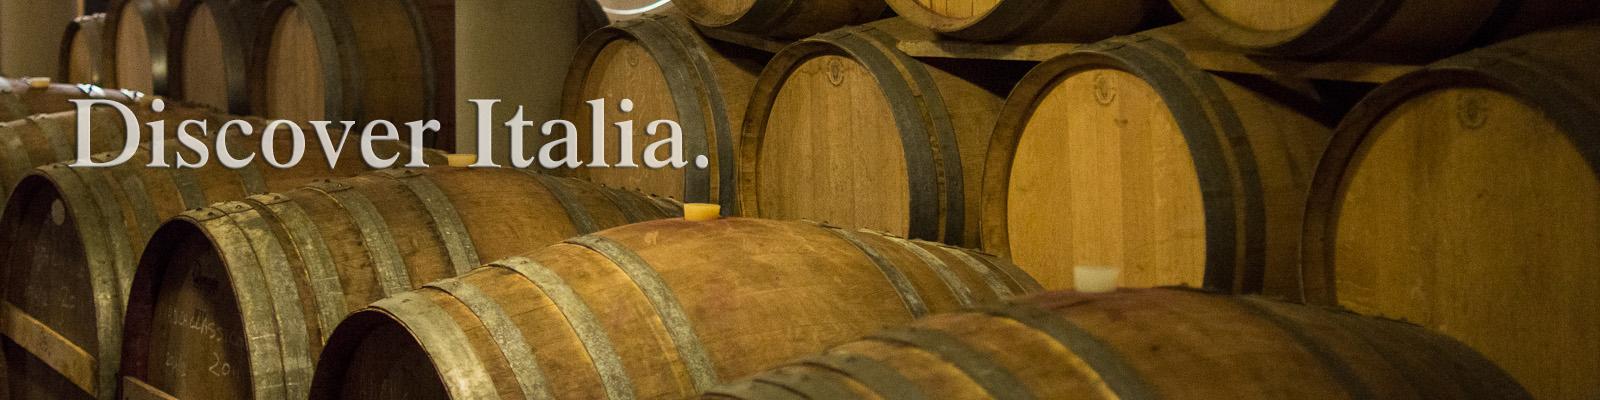 website-slider-images-discover-italia